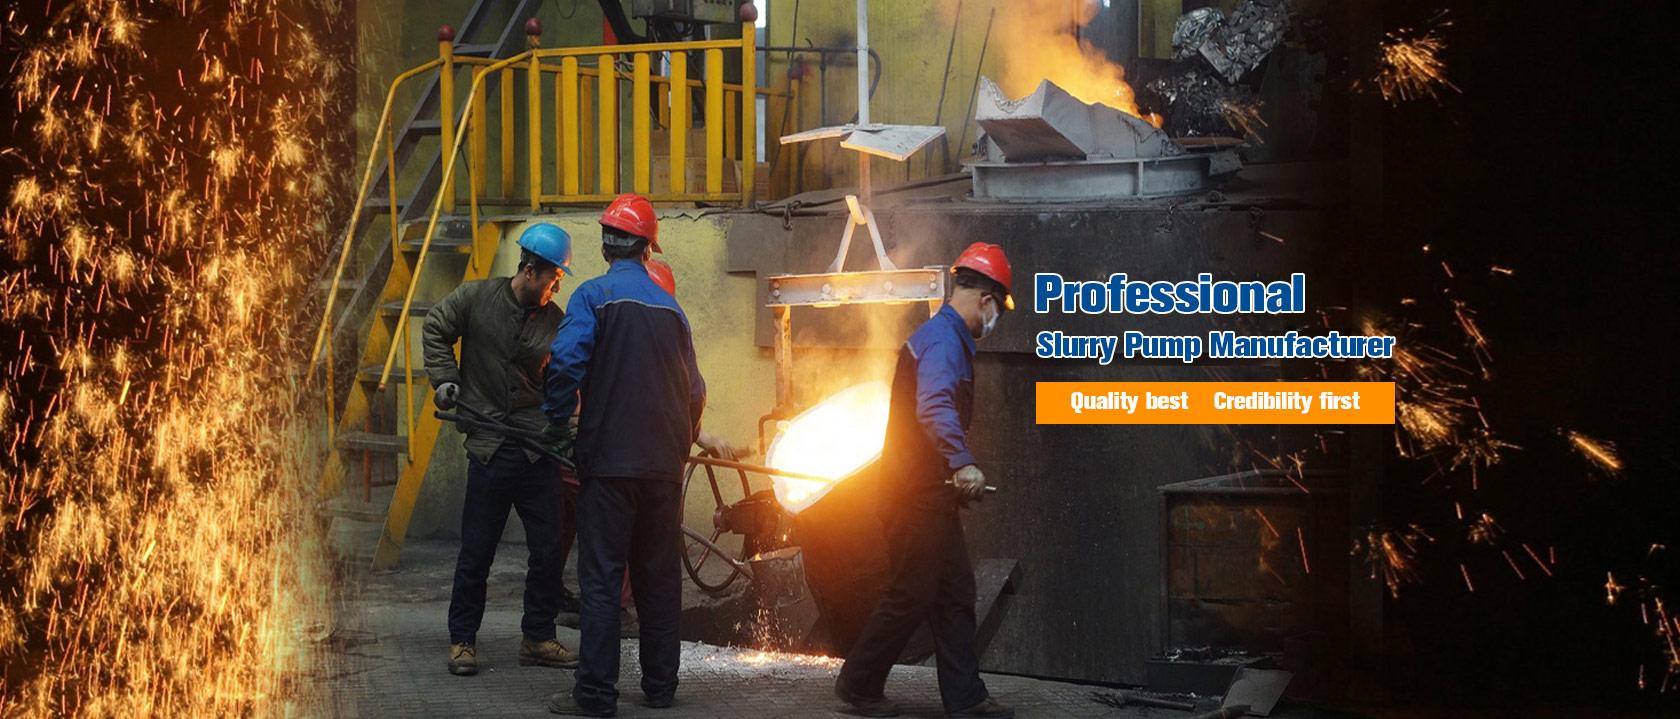 Professional Slurry Pump Manufacturer